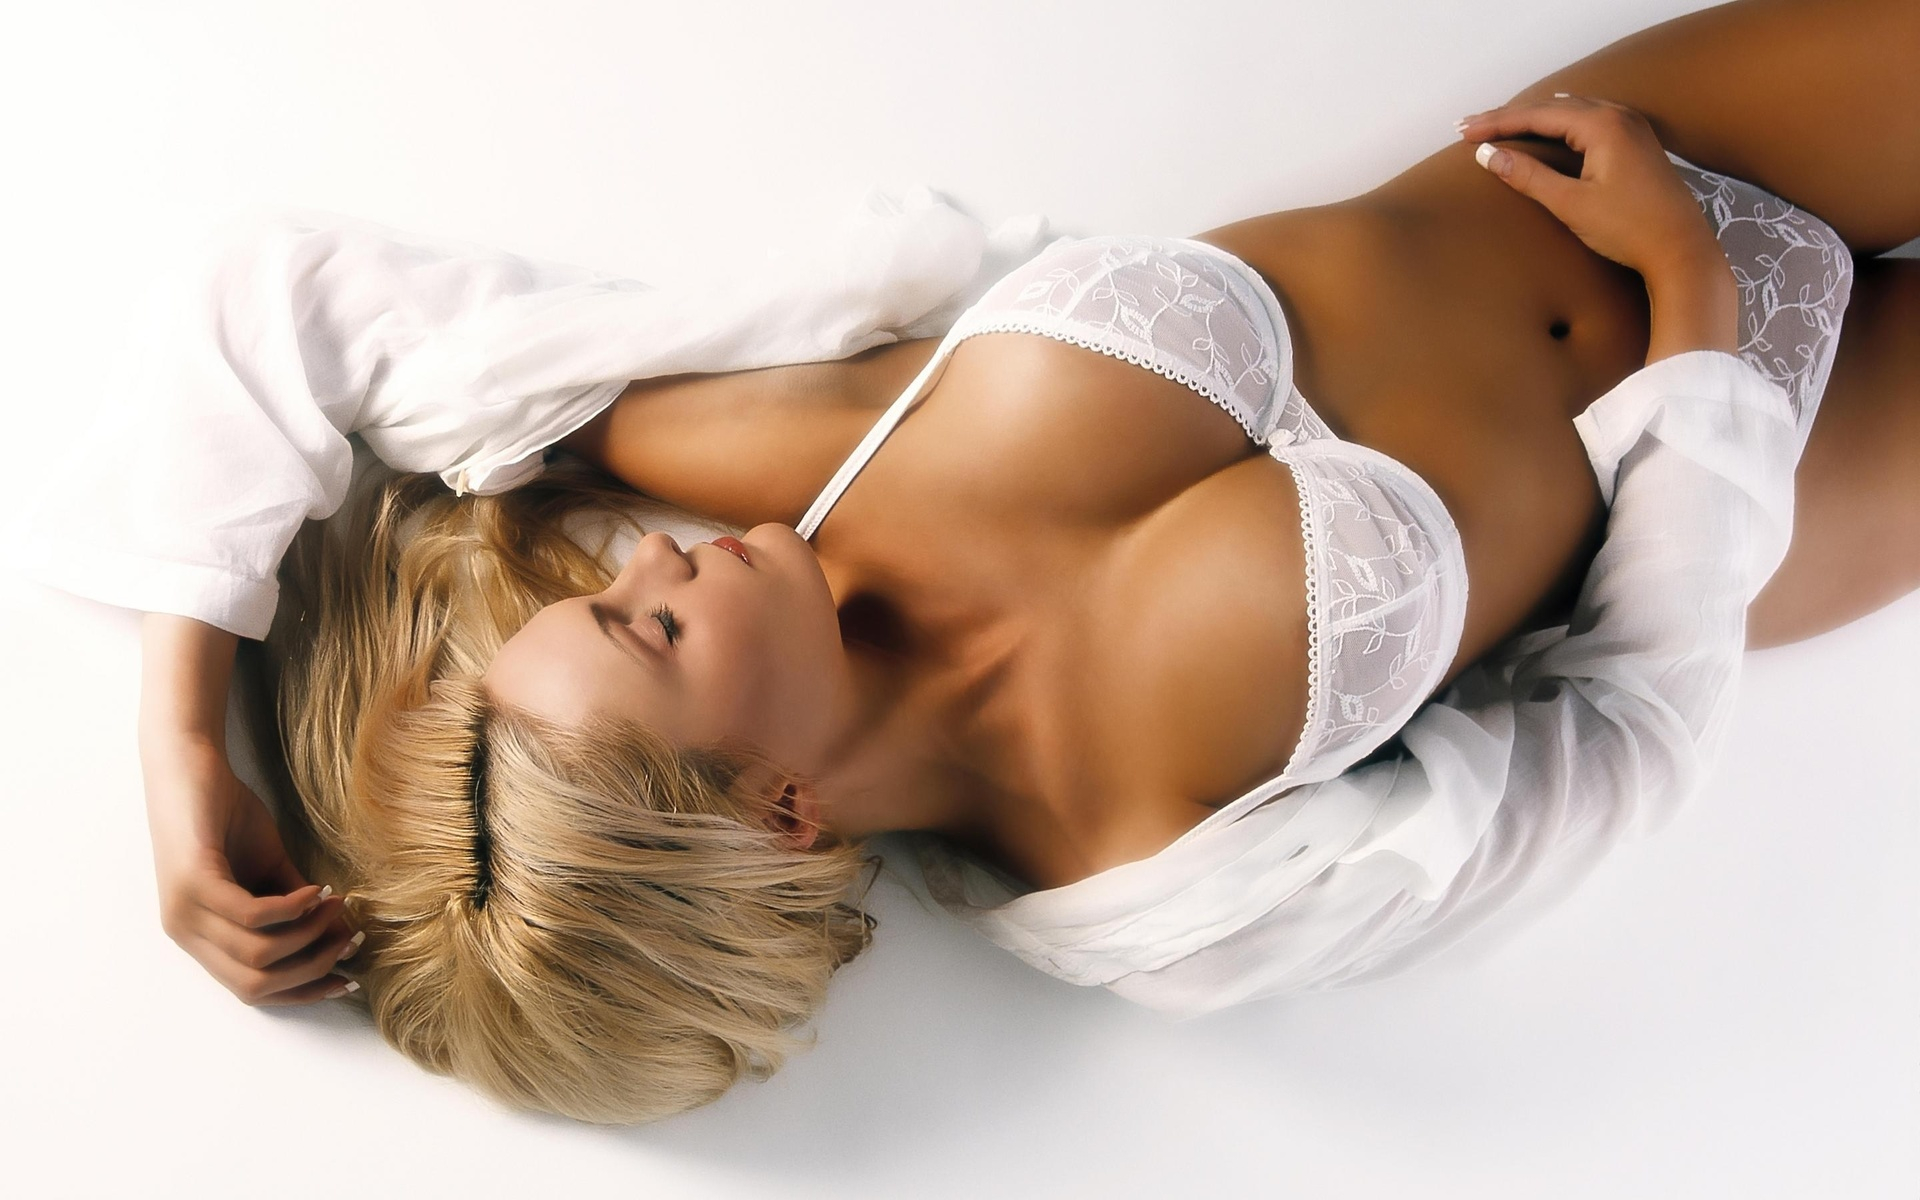 Блондинка тело картинка